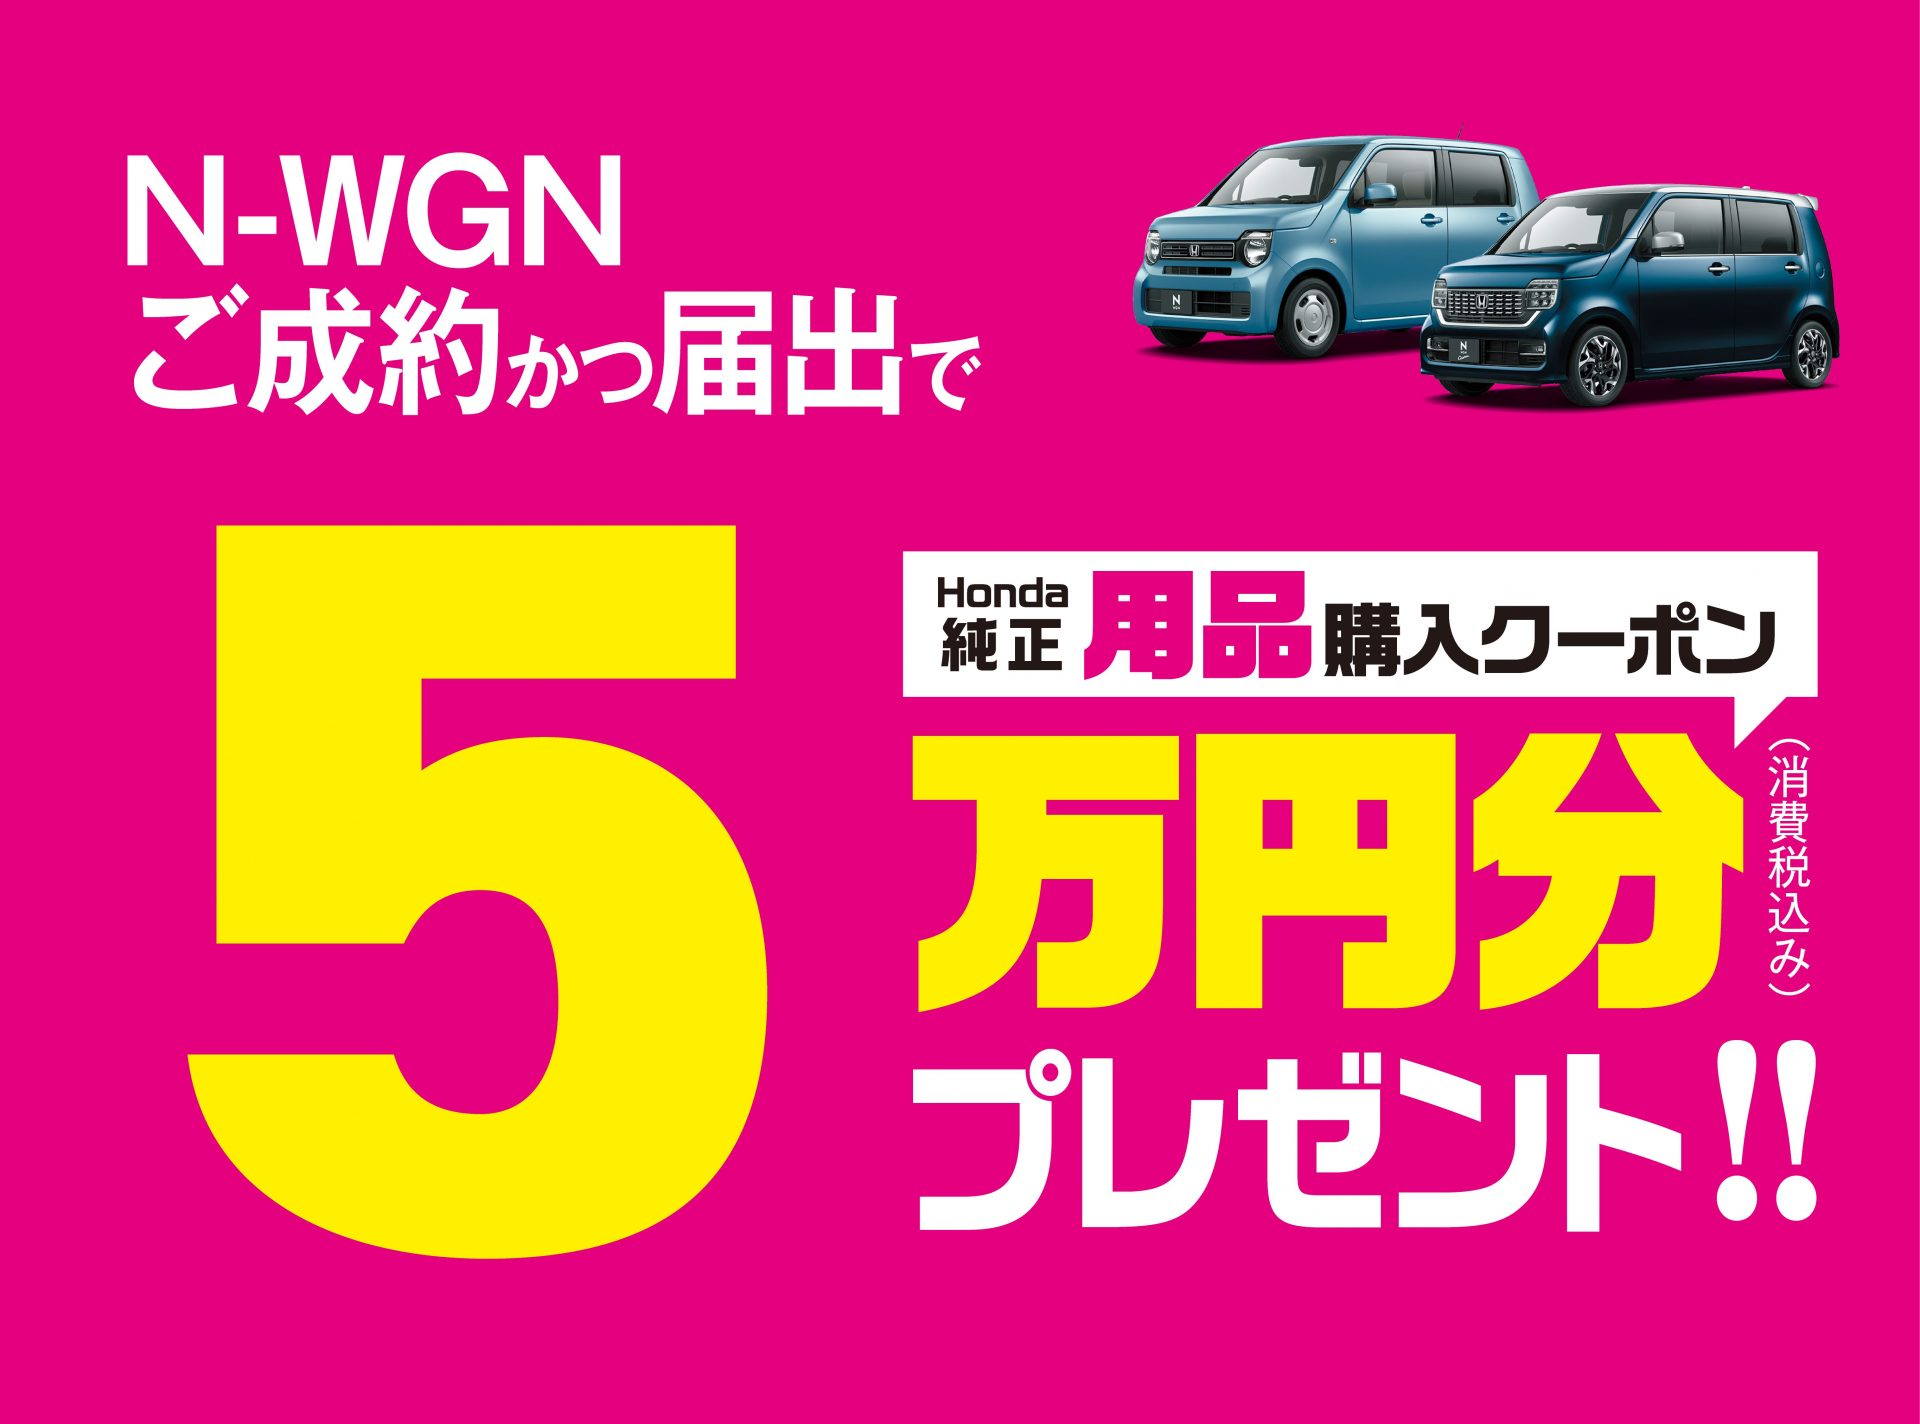 N-WGN  オプション購入クーポン 5万円分キャンペーン